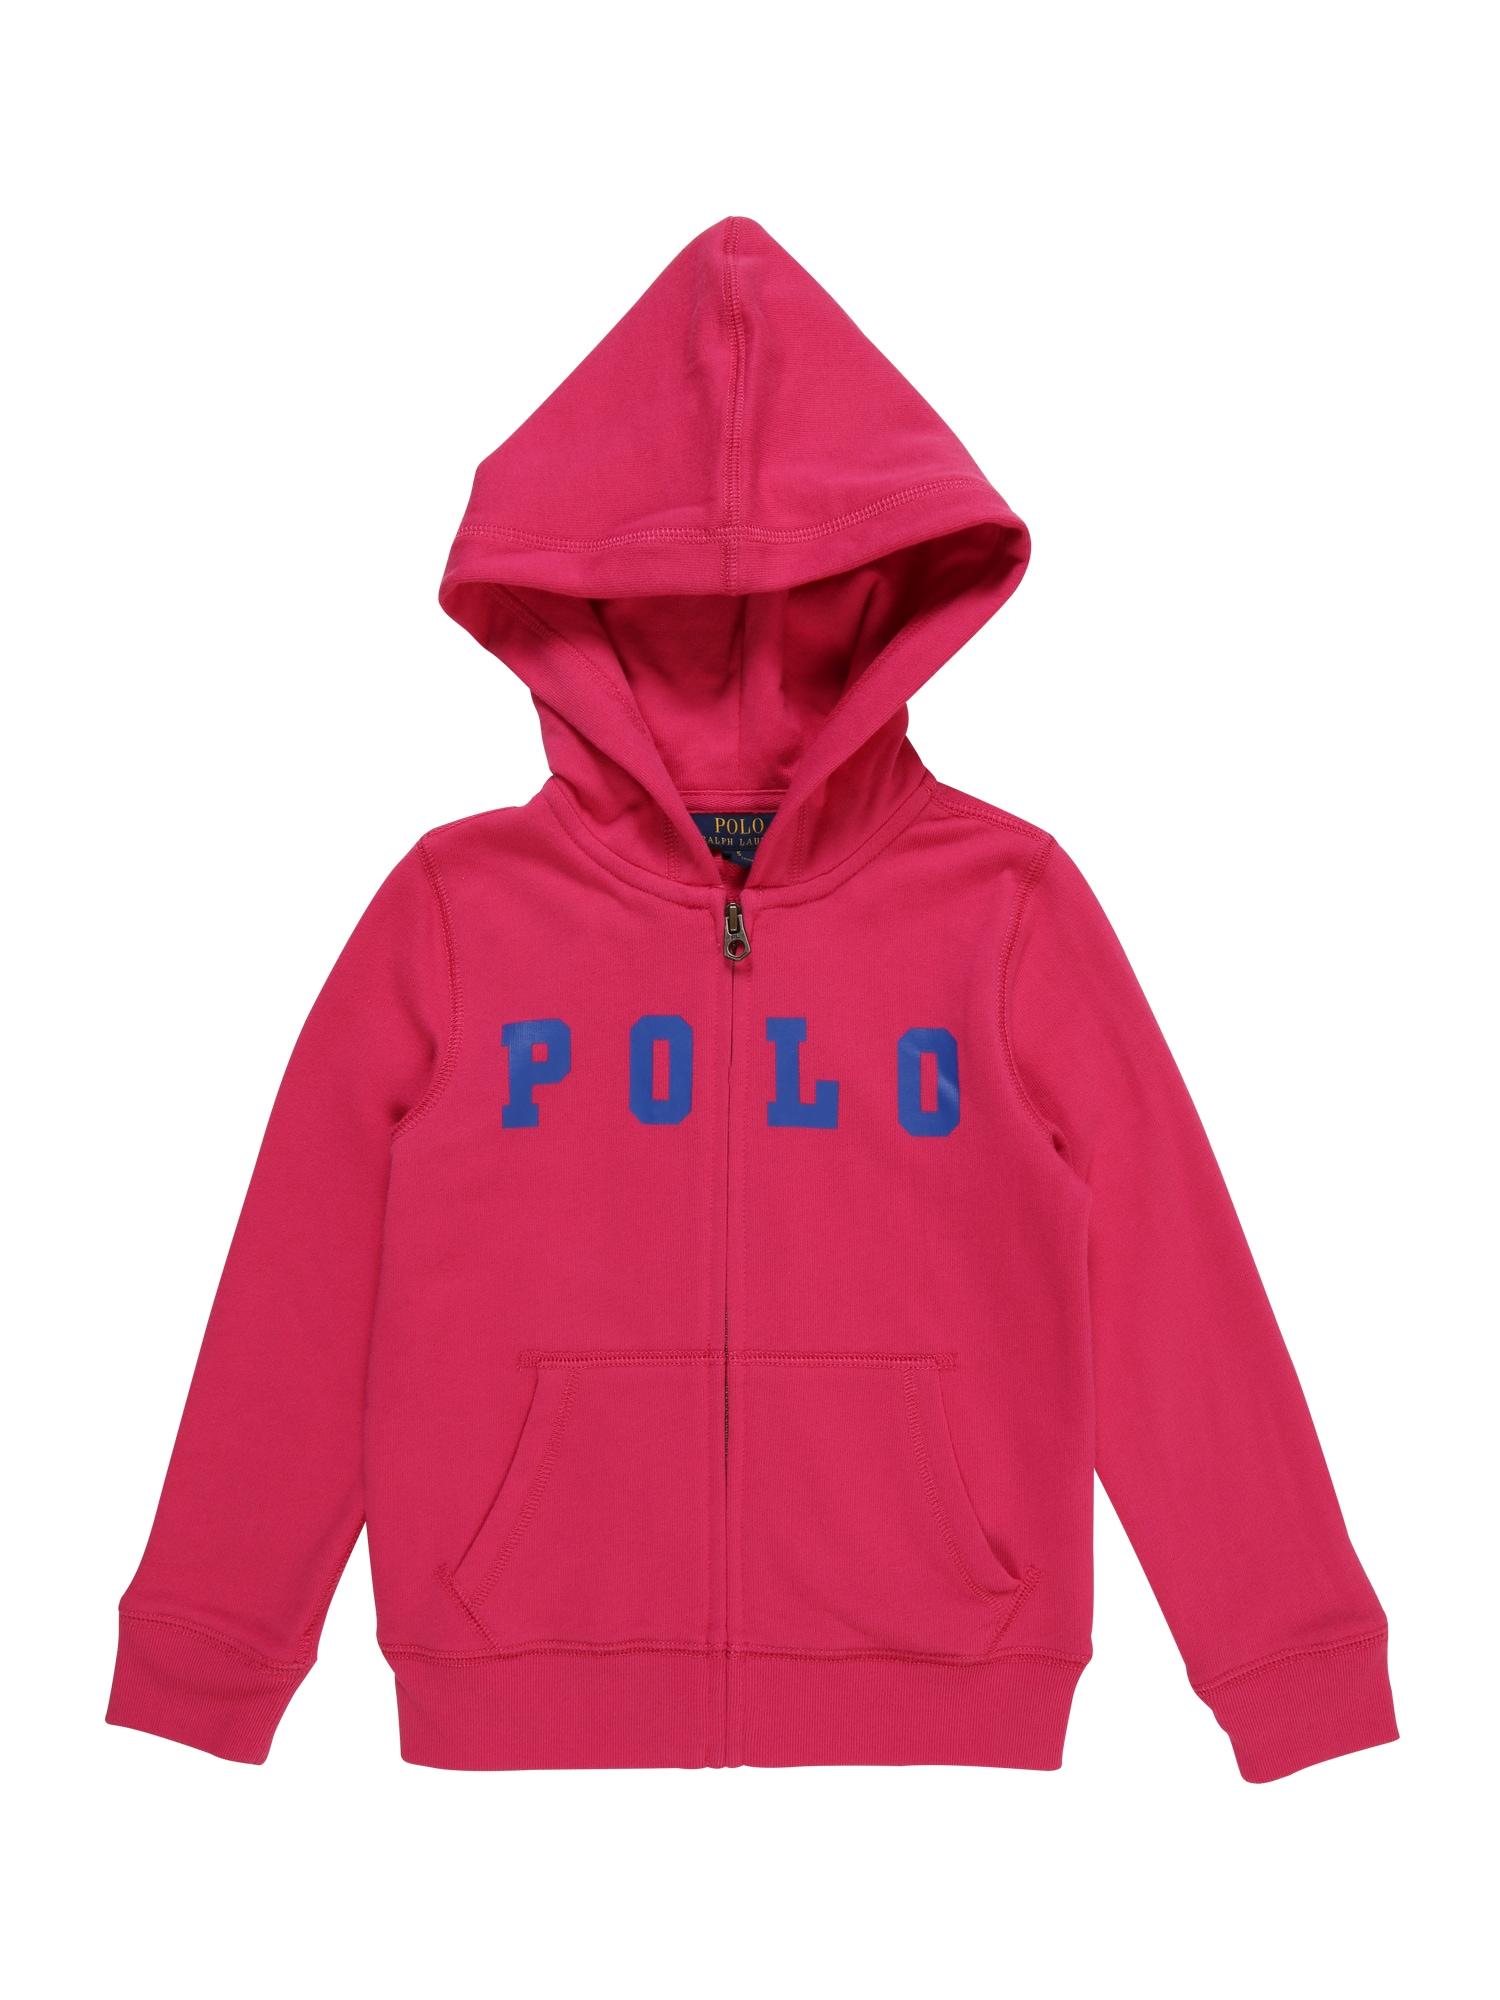 Mikina s kapucí ATLANTIC TERRY-POLO modrá pink POLO RALPH LAUREN